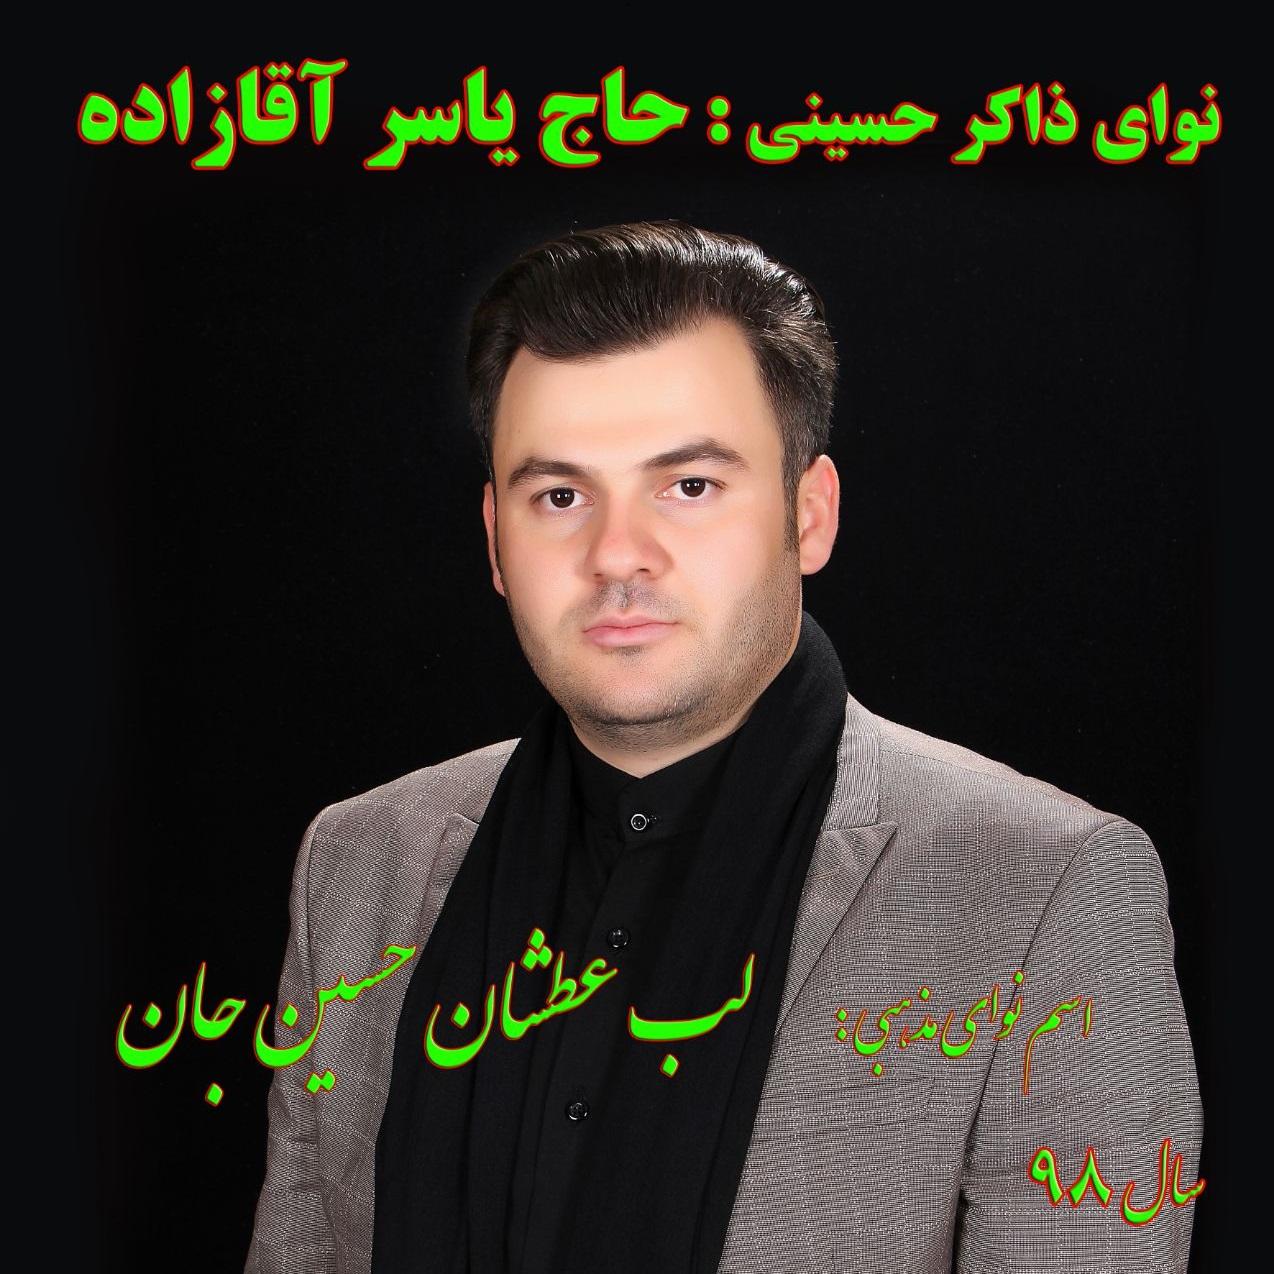 http://s4.picofile.com/file/8372201600/05Haj_Yaser_Aghazadeh_Lab_Atashan_Hossein_Jan.jpg